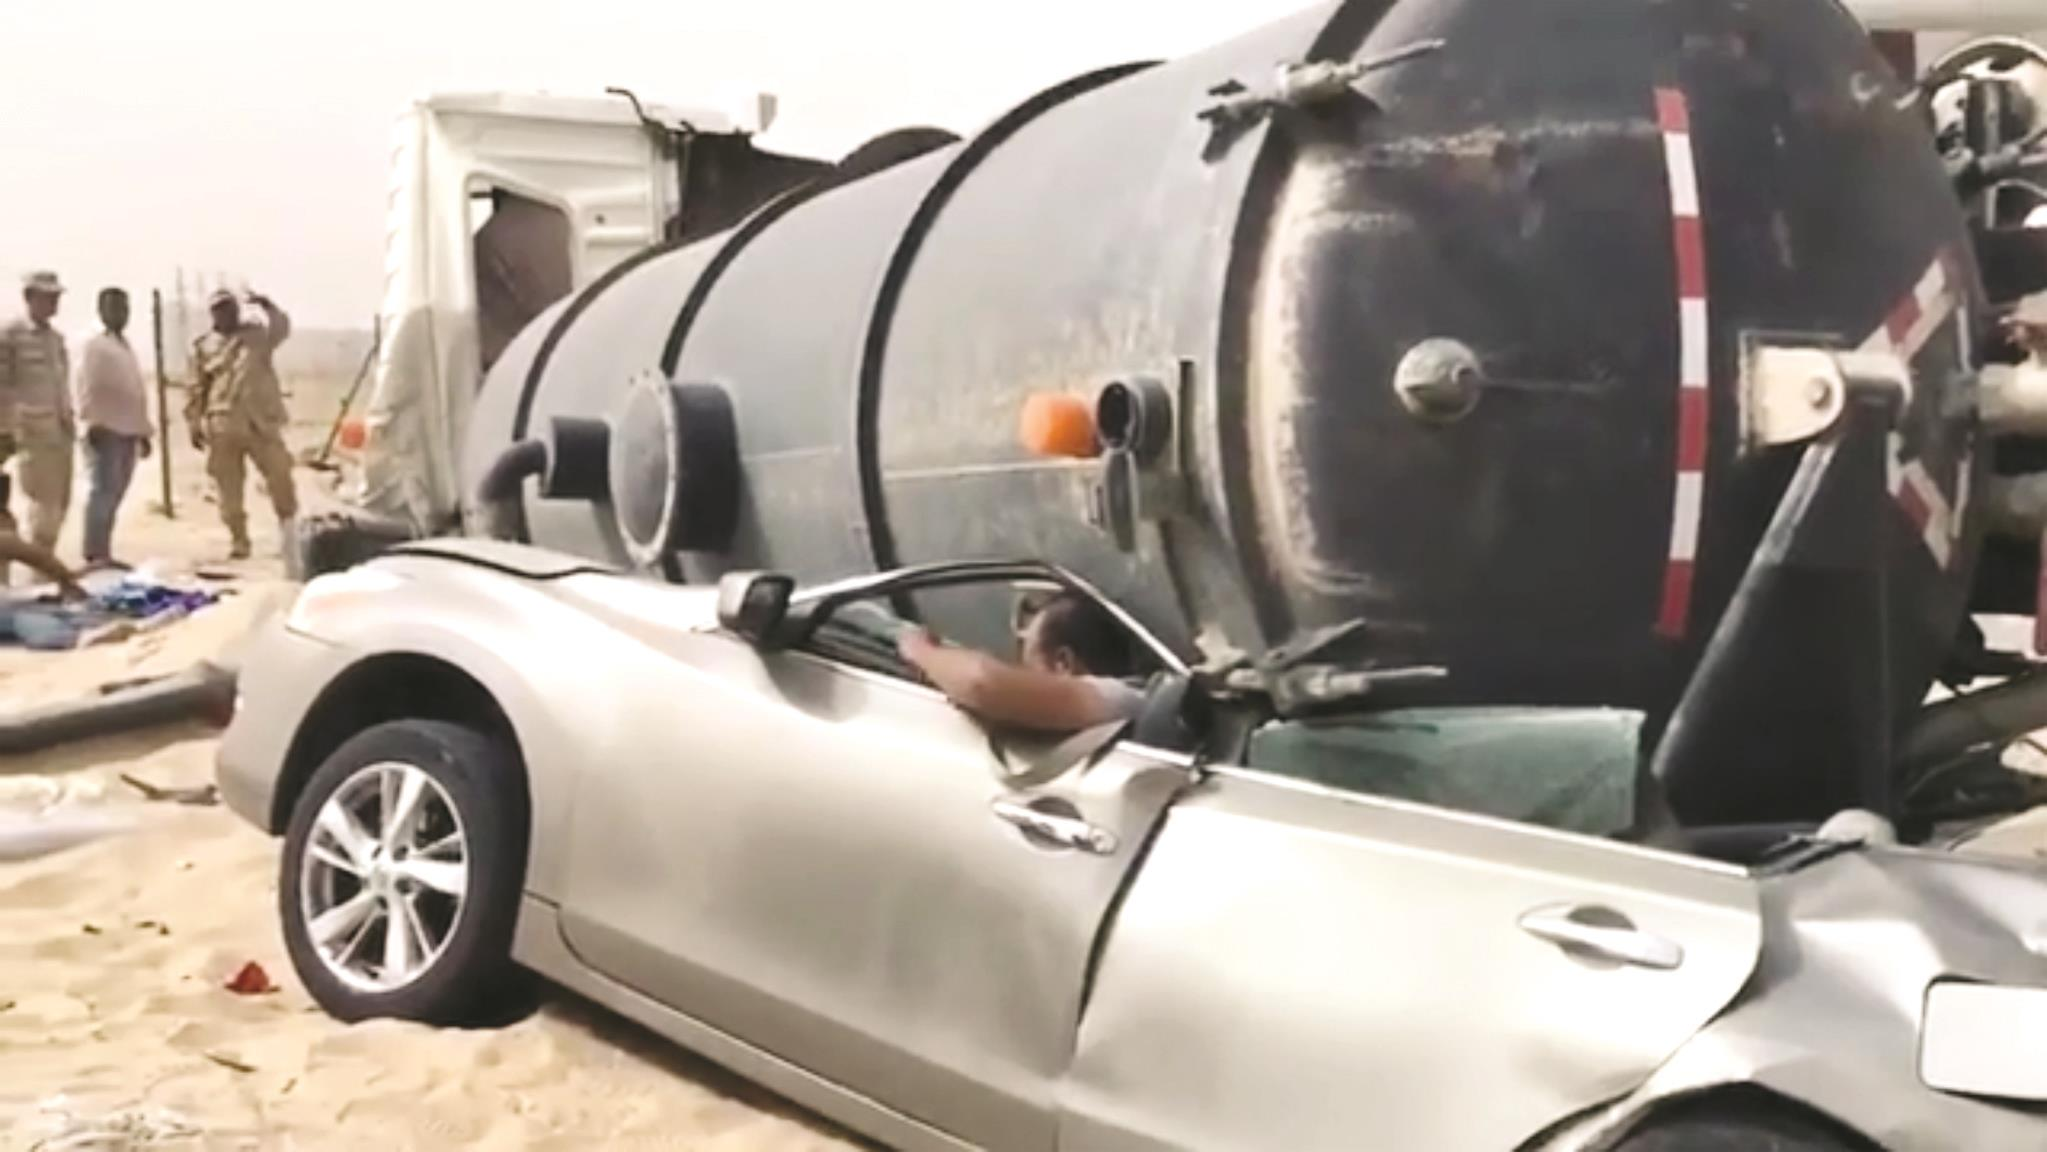 Egyptian has miraculous escape as tanker flattens his car